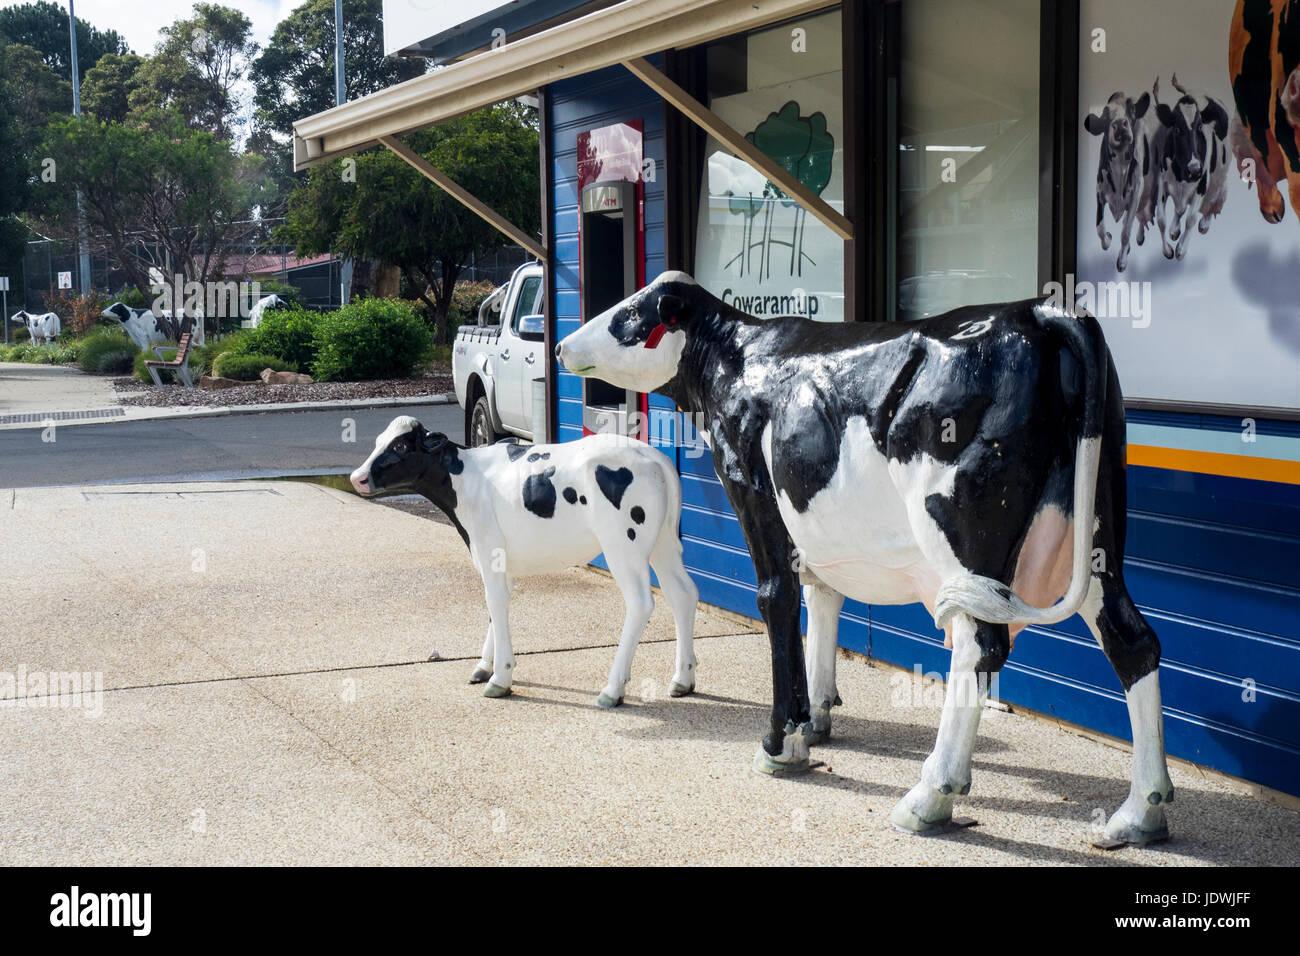 two-life-size-fibreglass-cow-sculptures-in-cowaramup-western-australia-JDWJFF.jpg